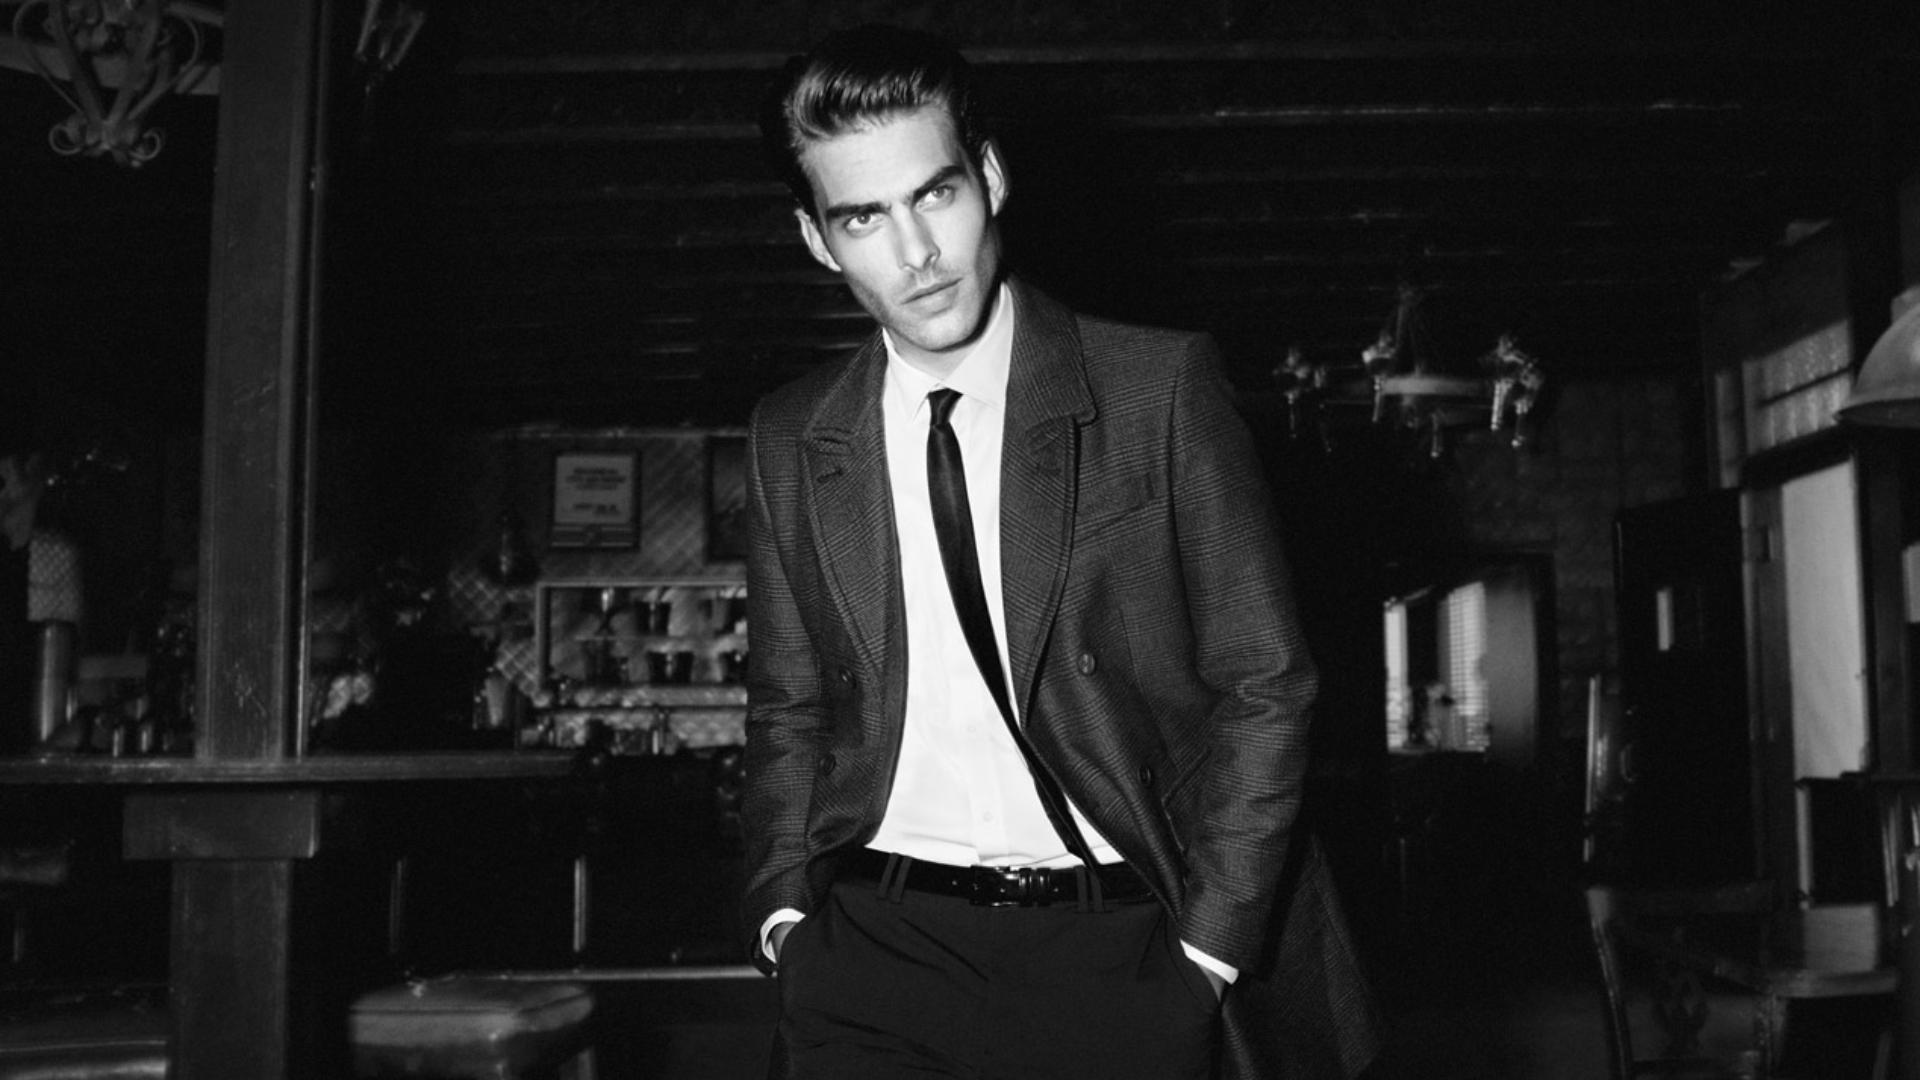 Jon Kortajarena, el modelo español más atractivo